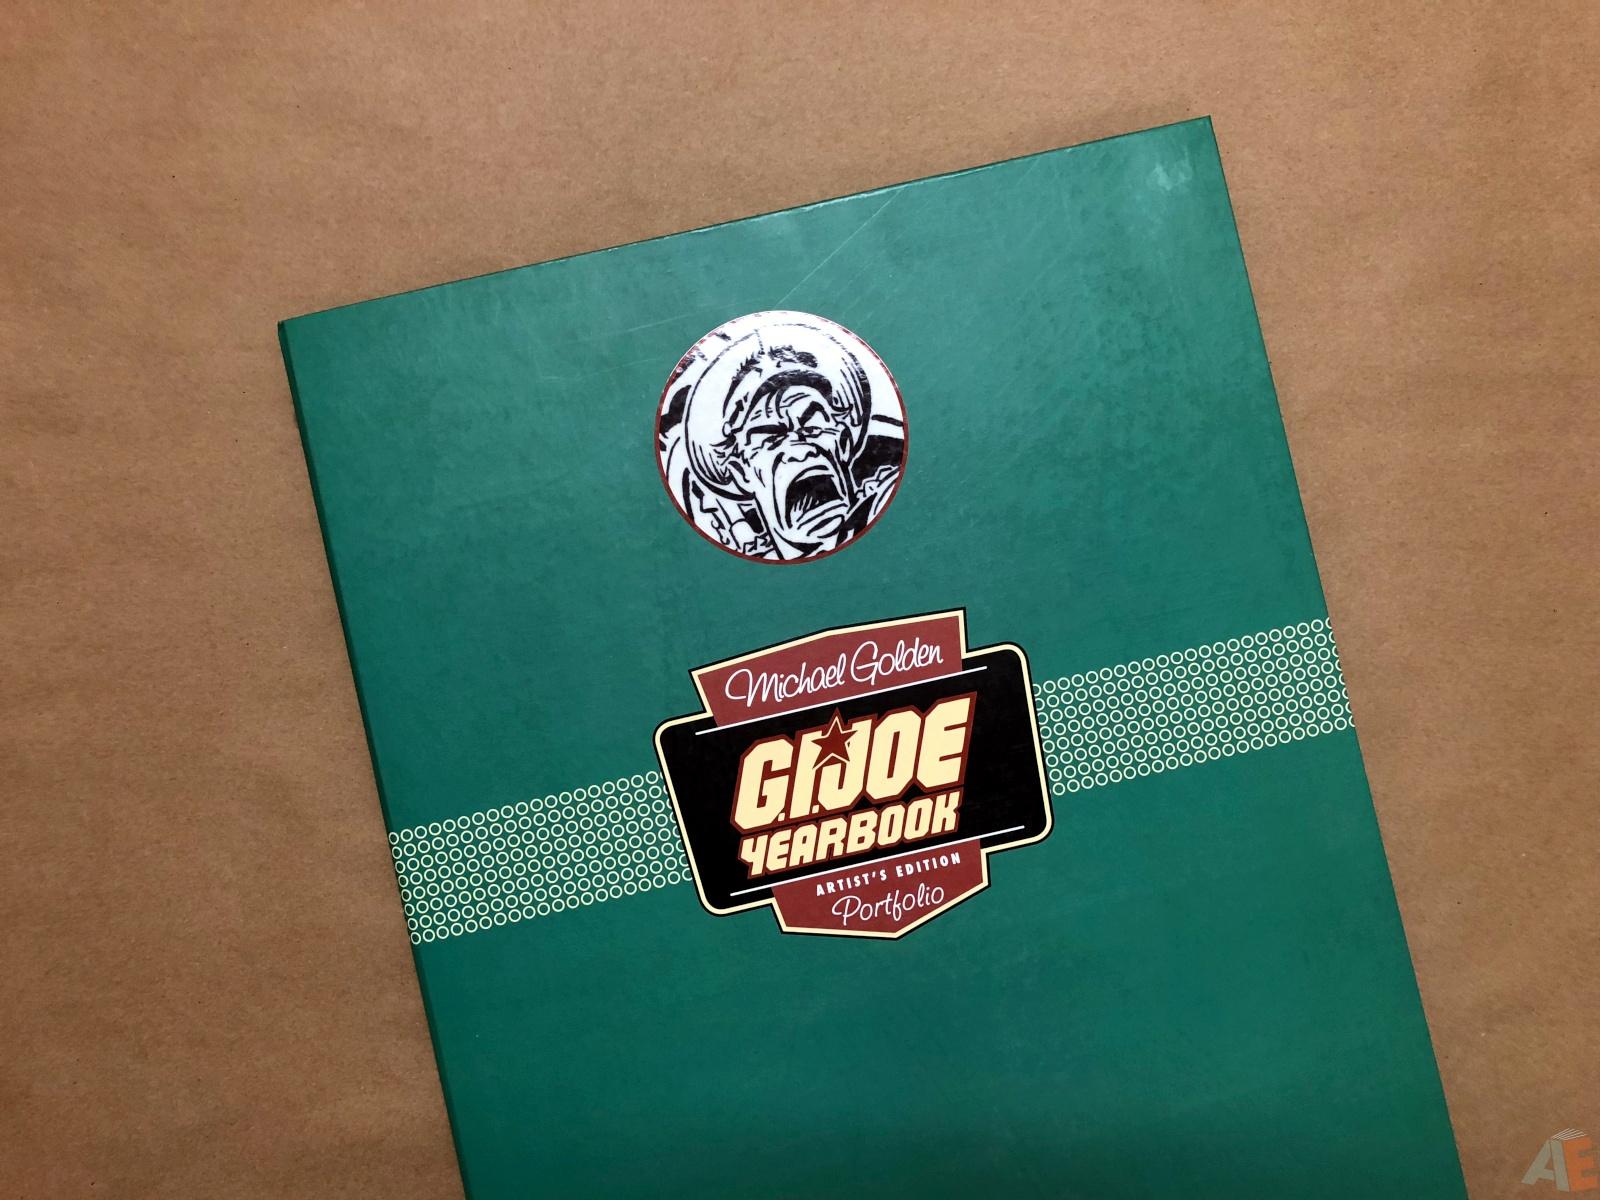 Michael Golden's G.I. Joe Yearbook: Artist's Edition Portfolio